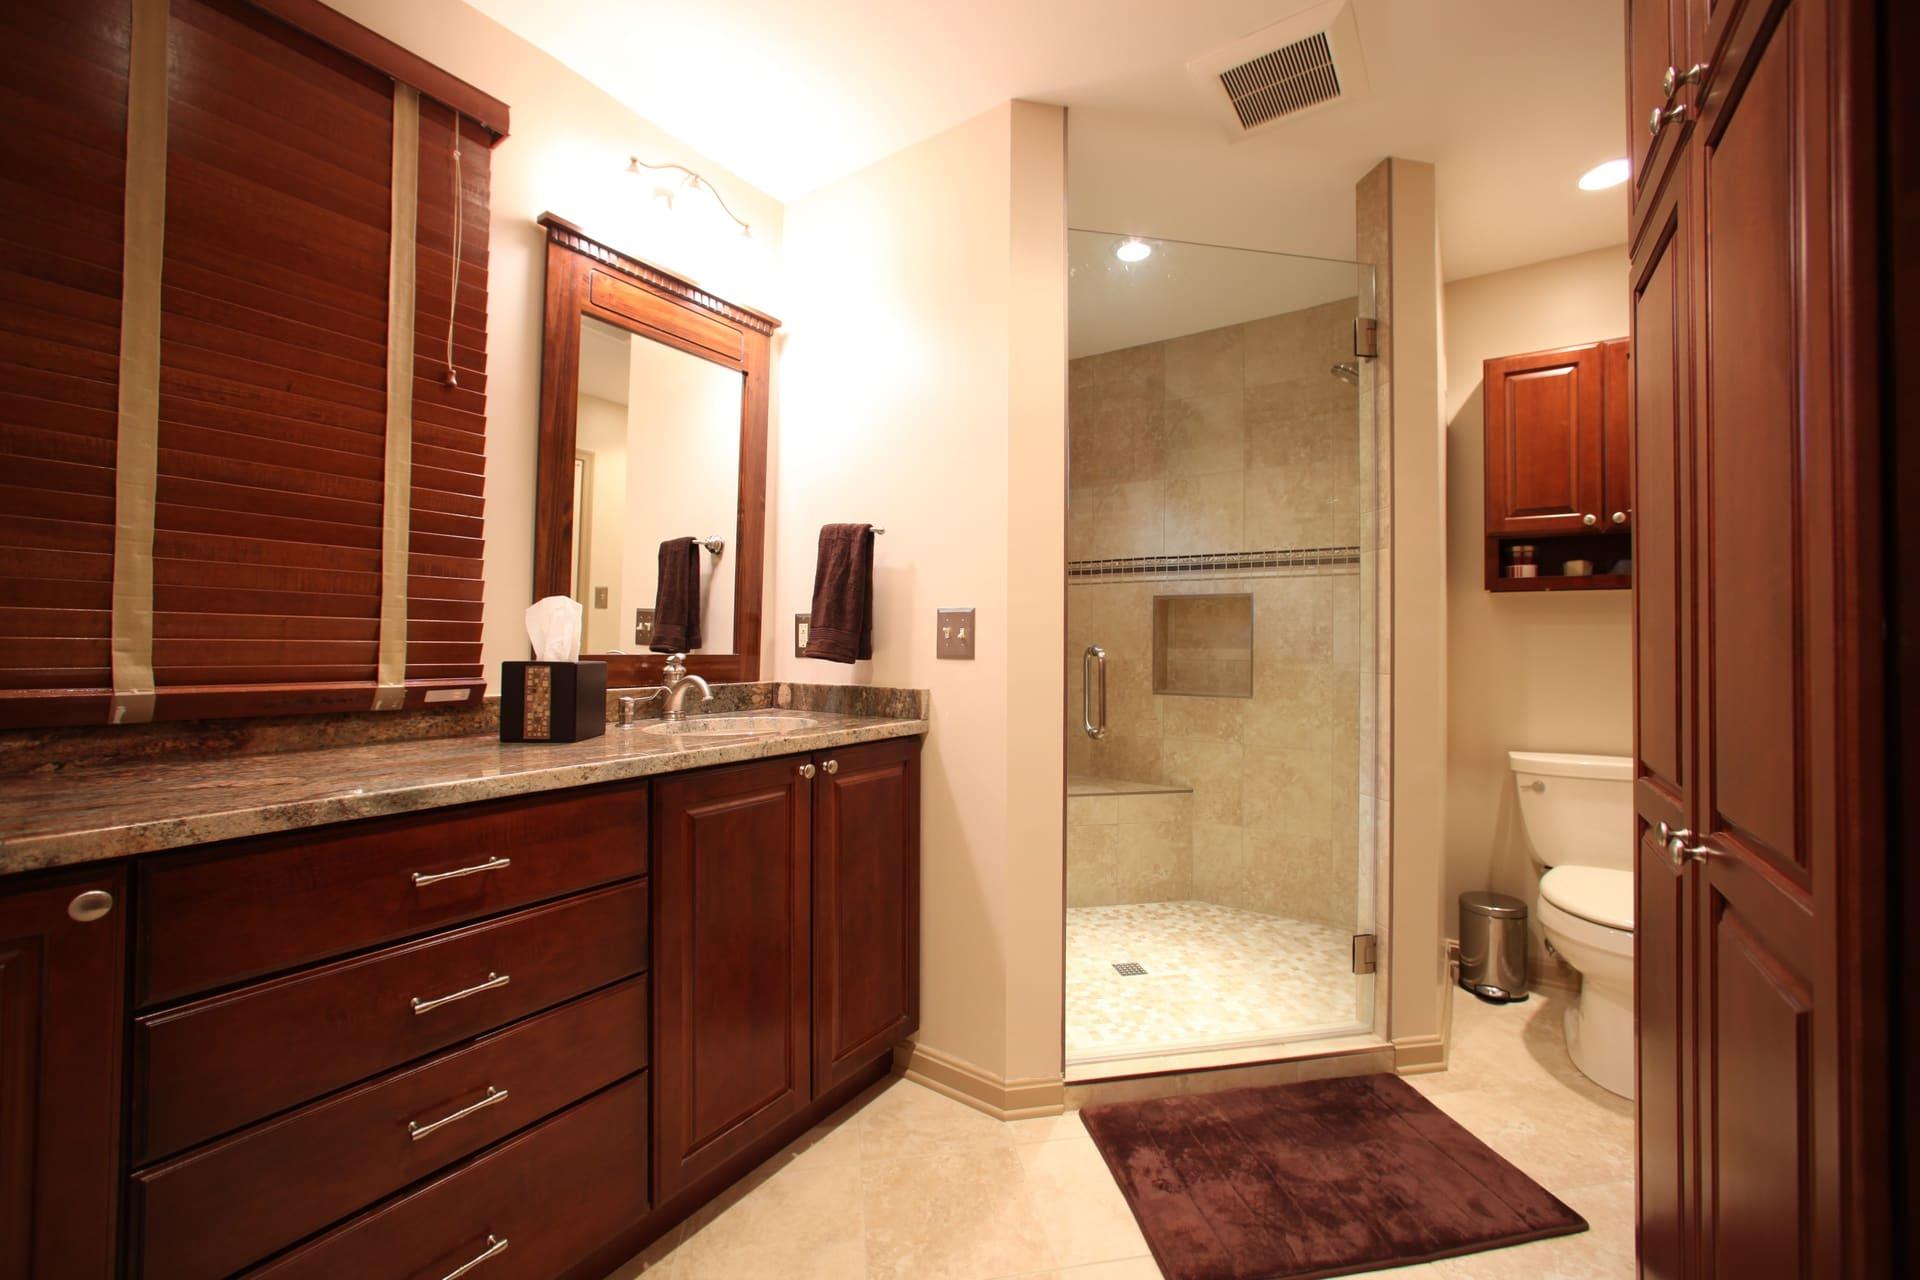 Bathroom Remodel - Hambleton Construction (4)